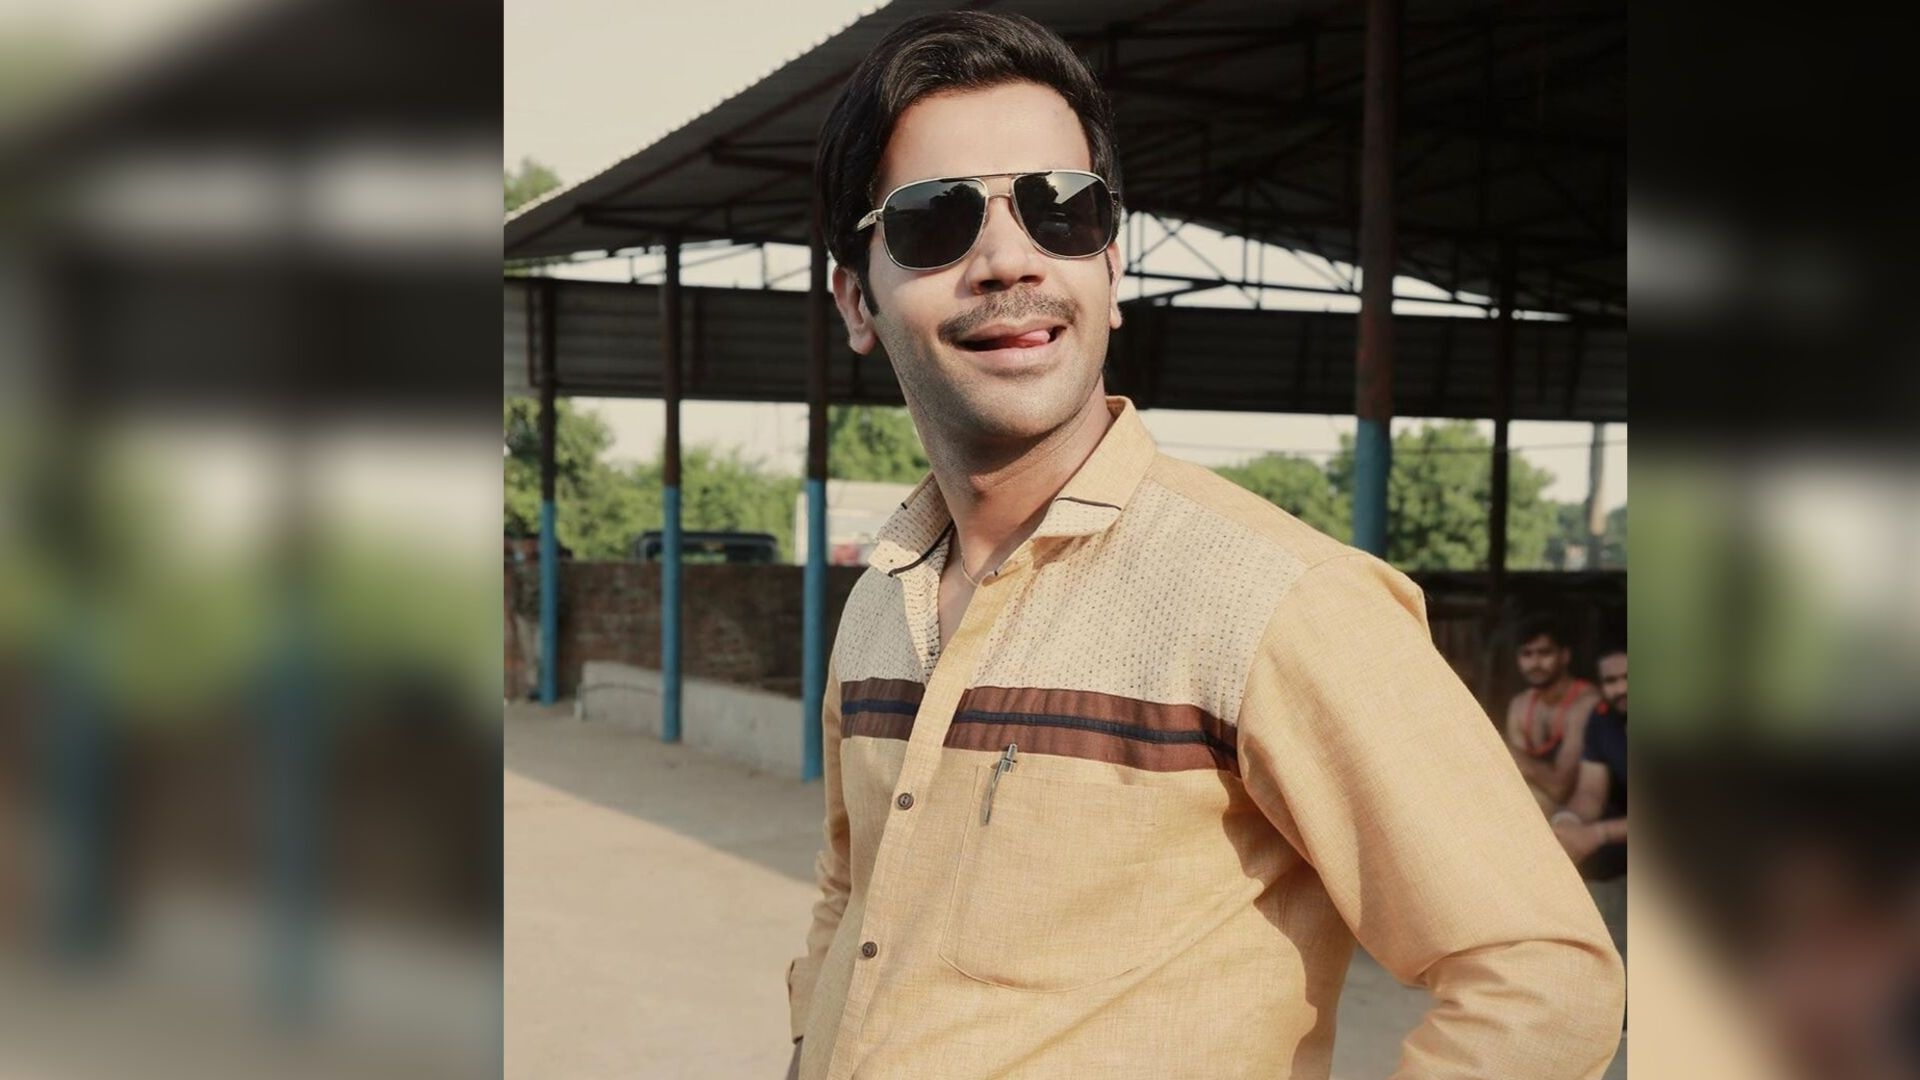 Made in China Trailer: Rajkummar Rao Leaves Us in Splits